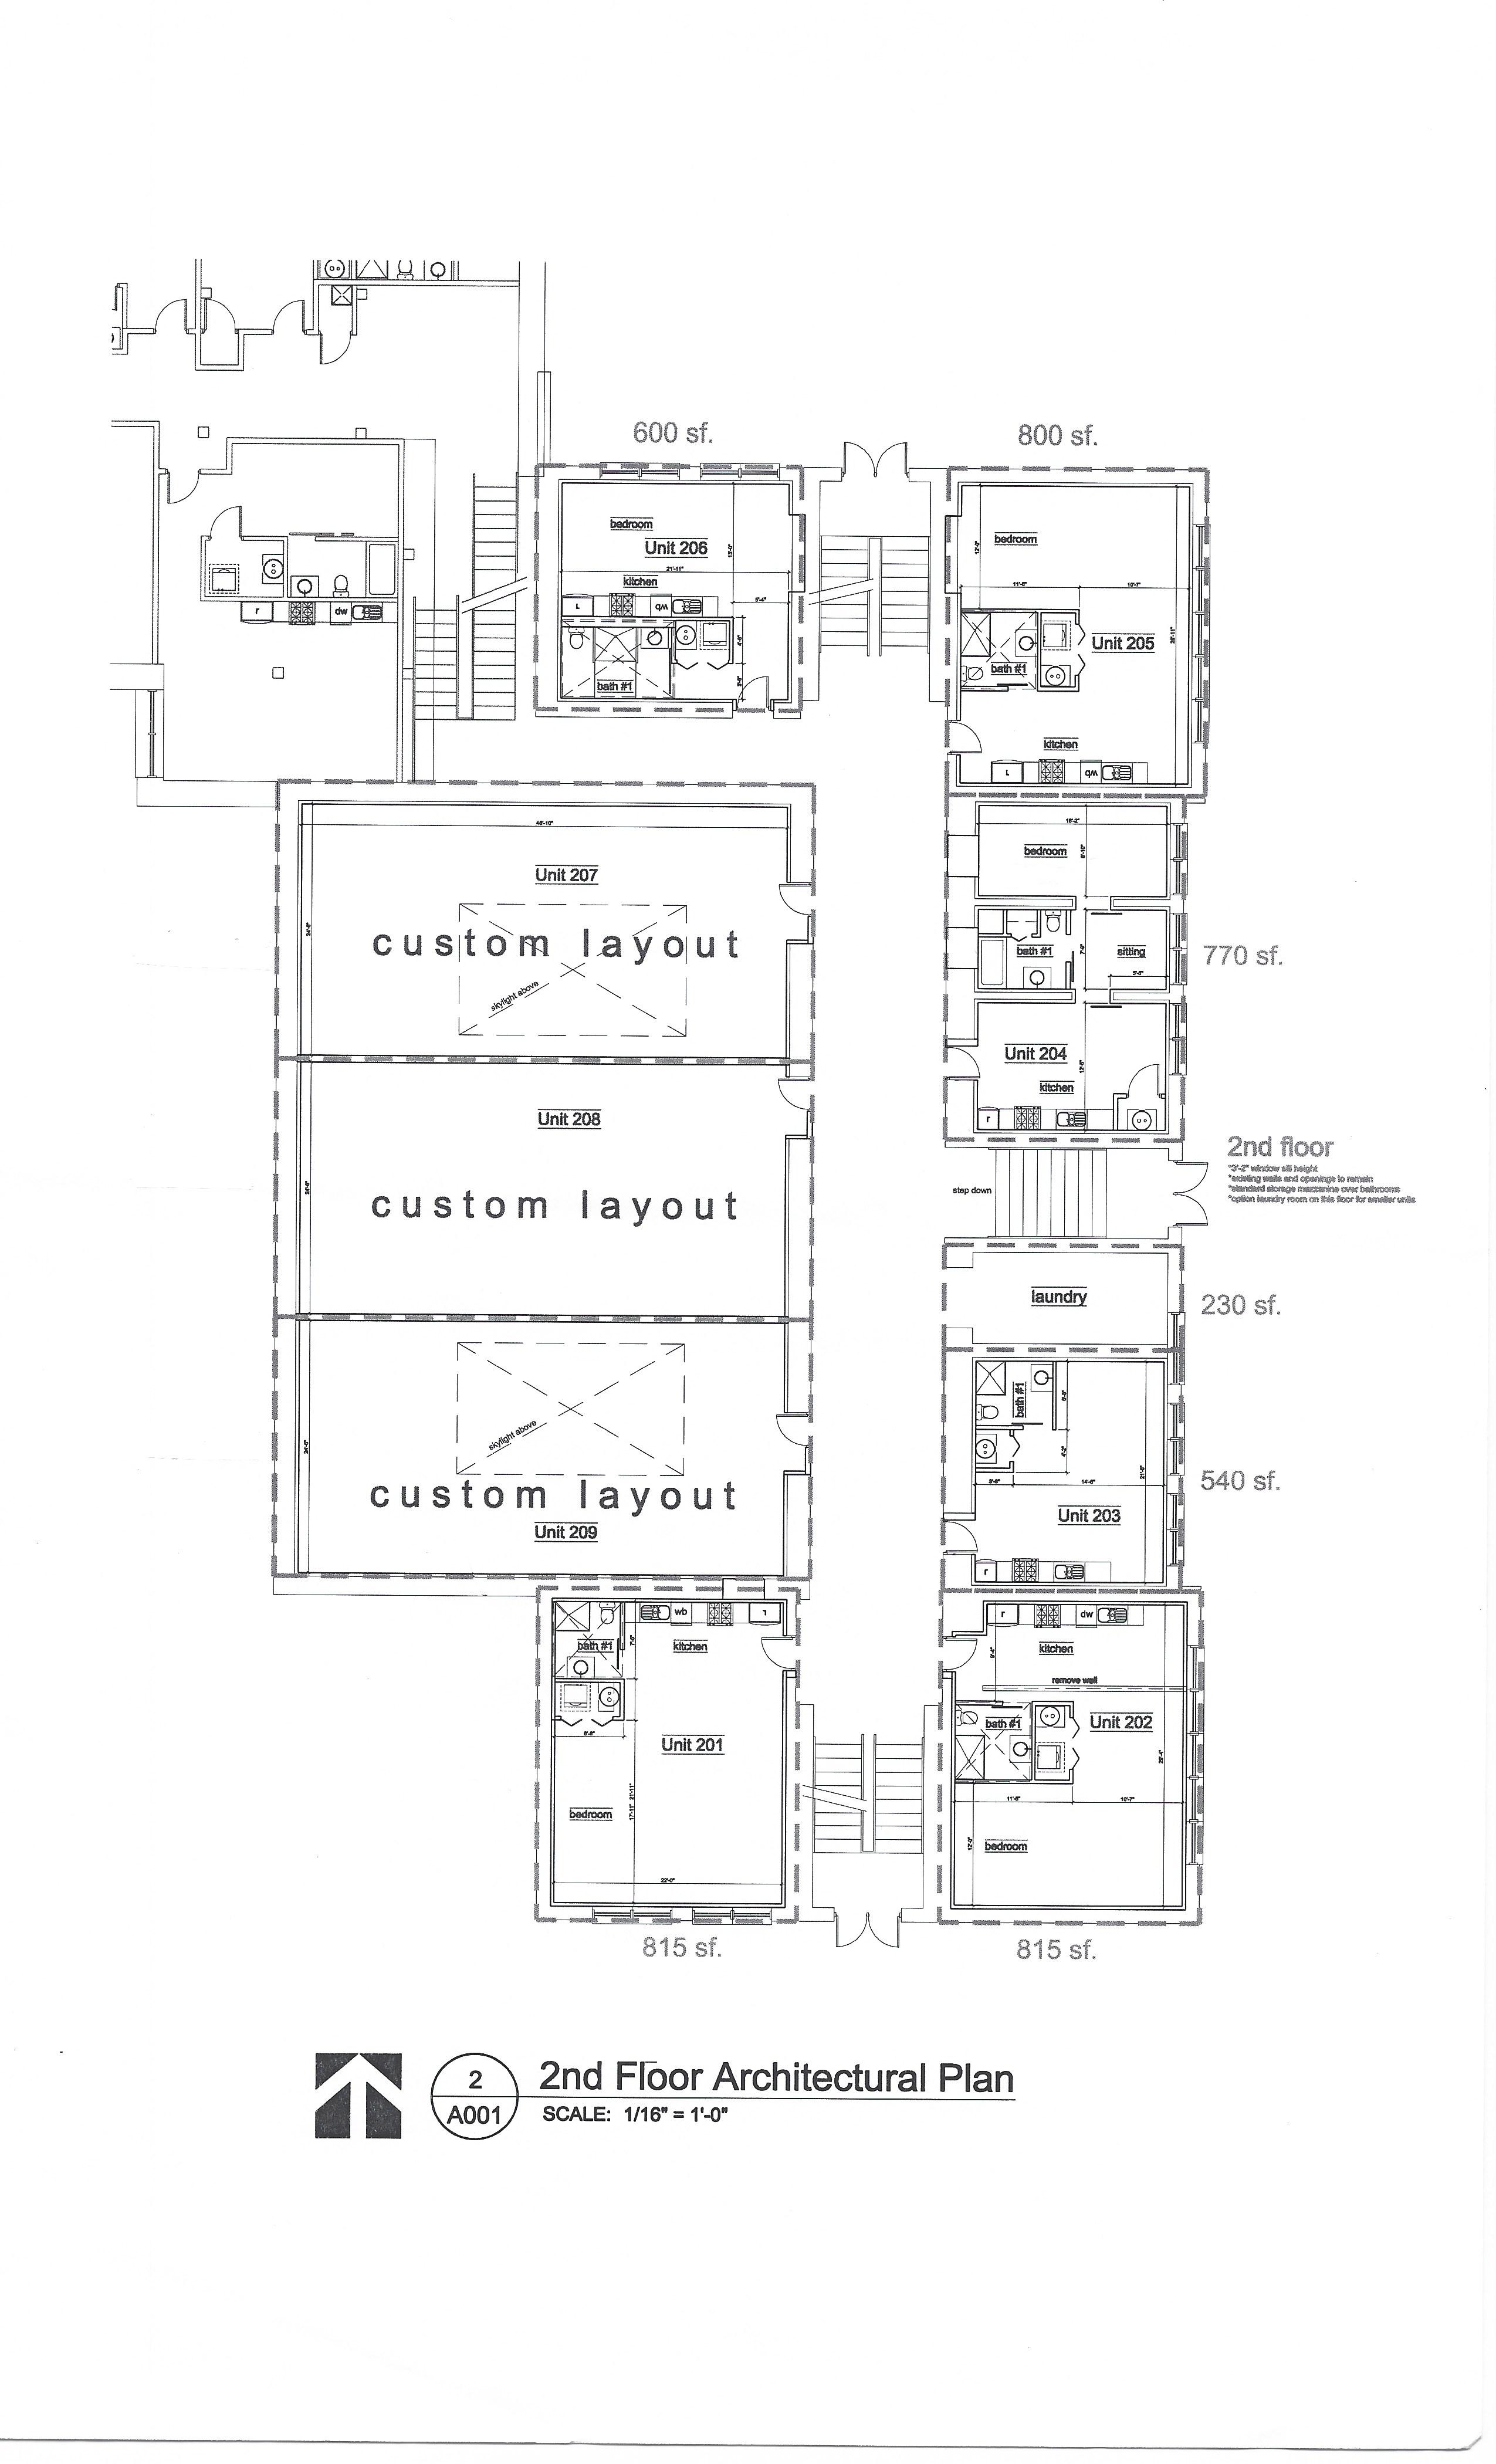 Central-Lofts-III-002